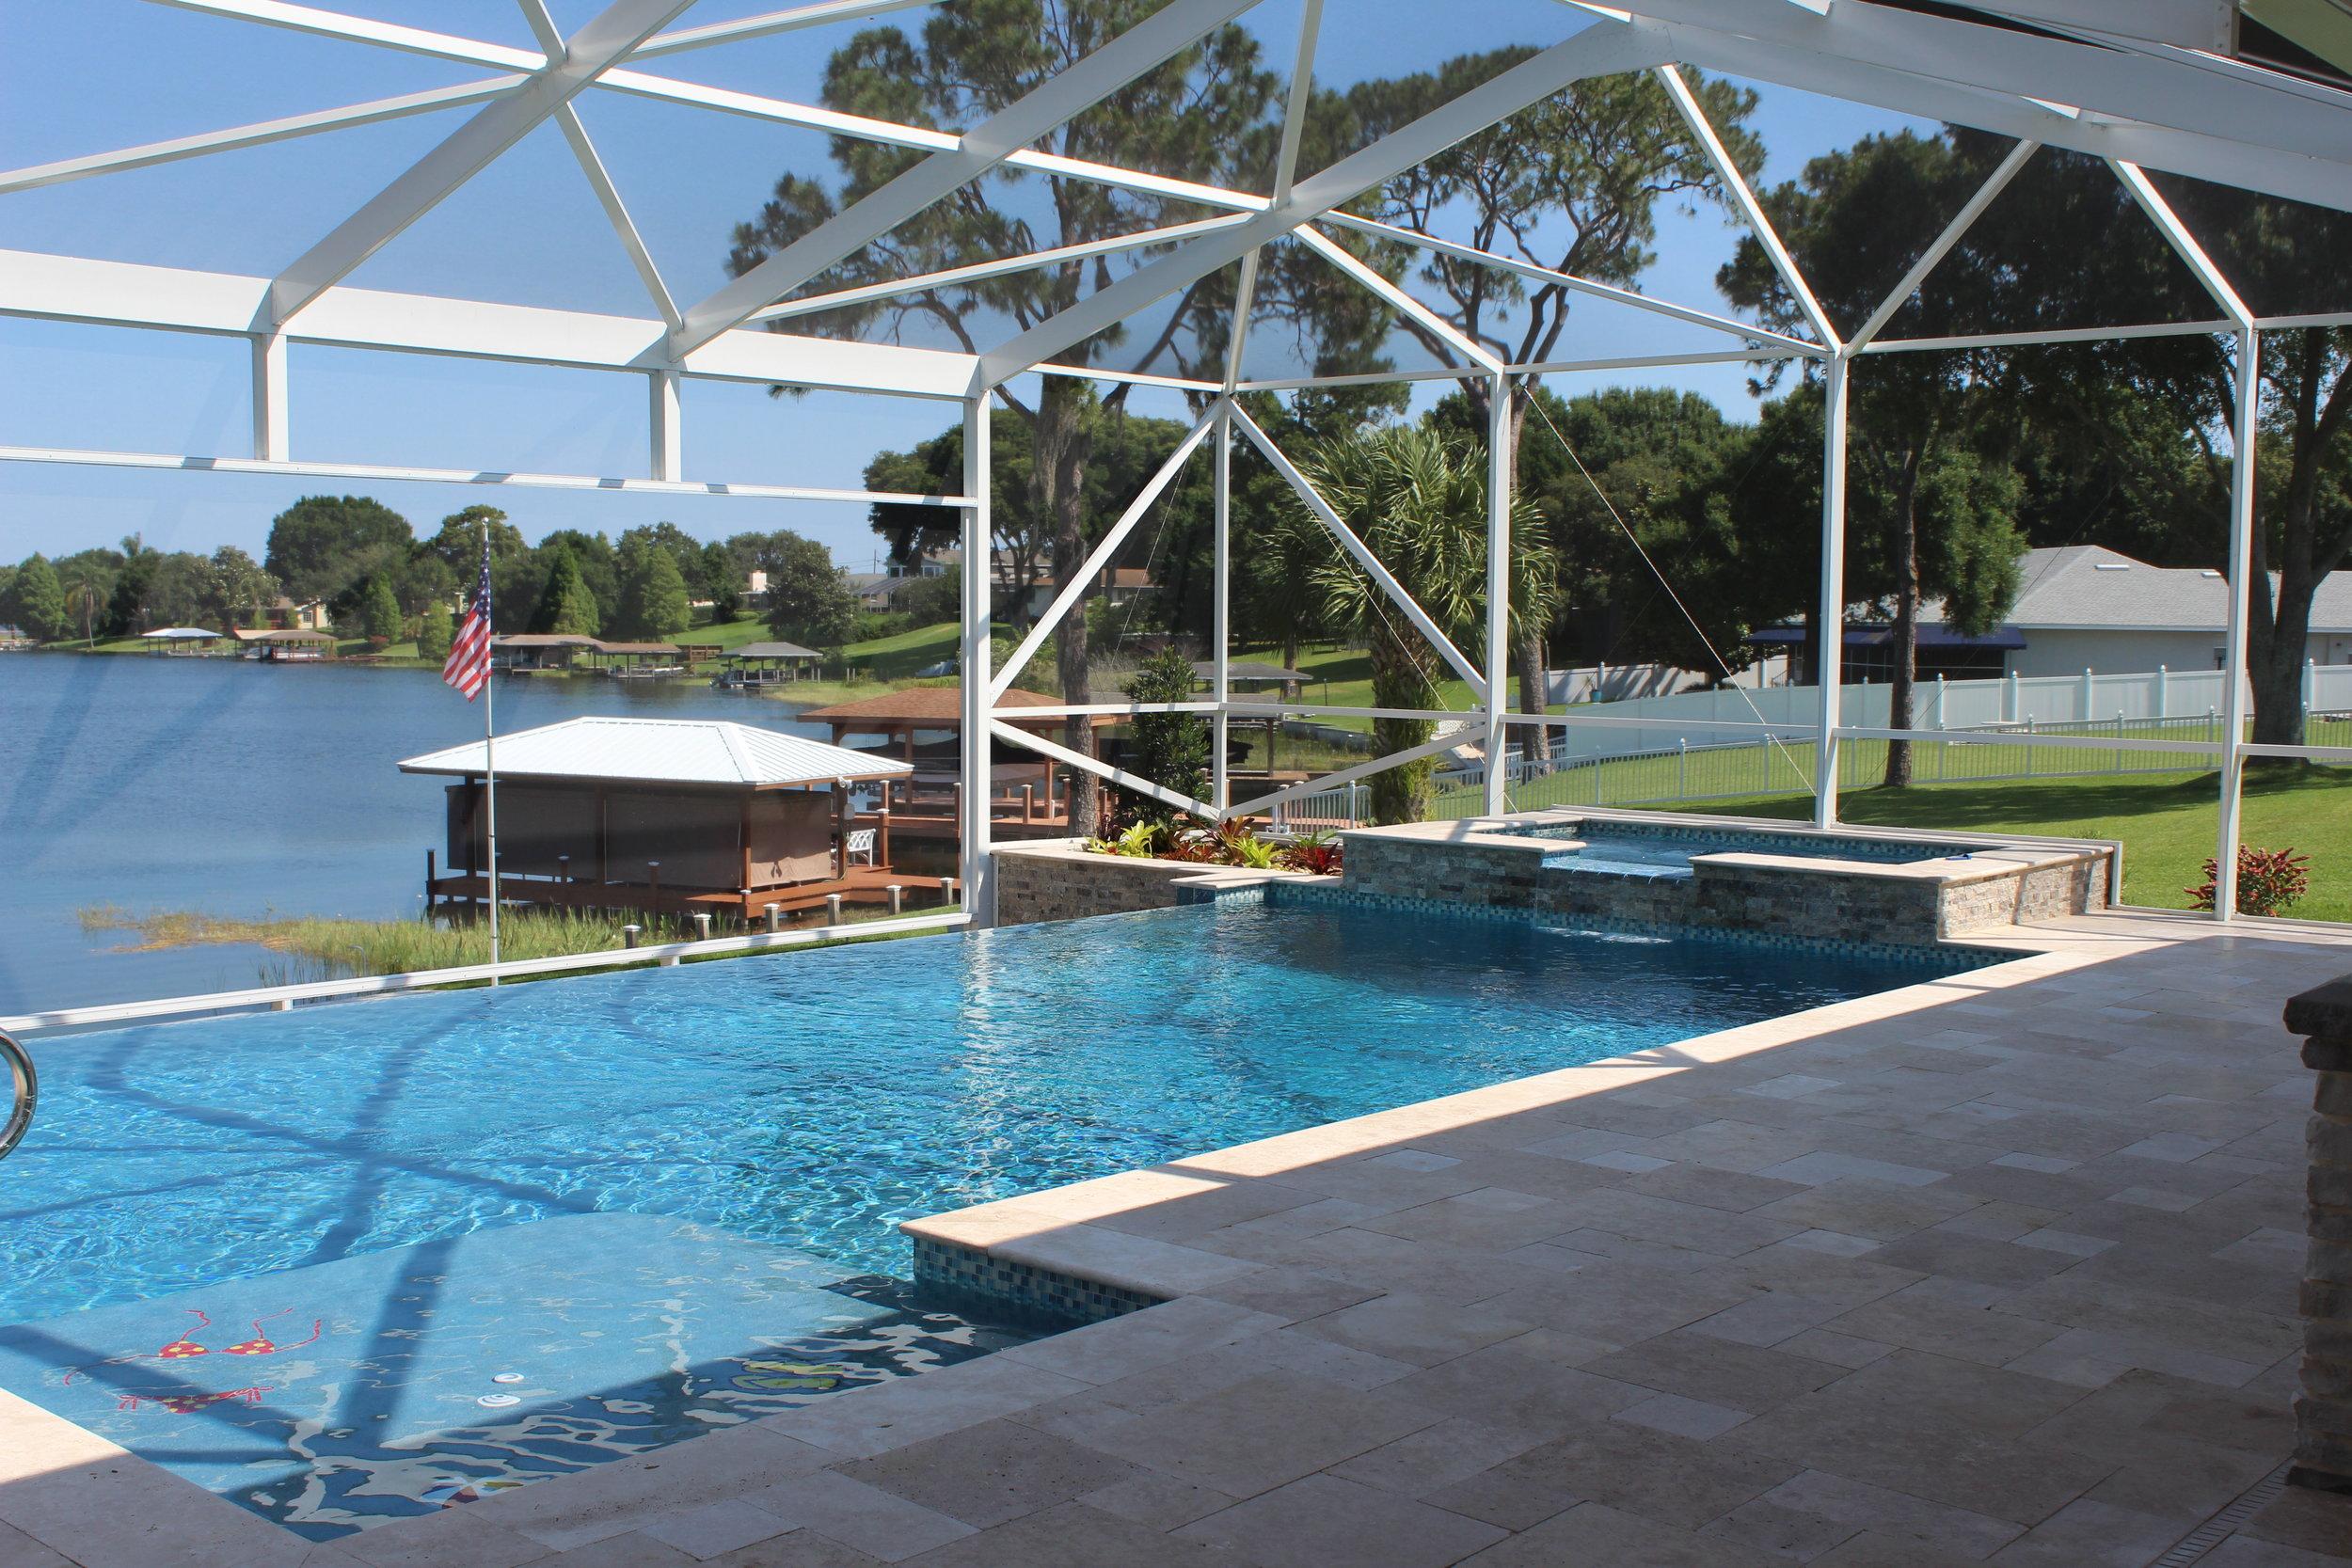 Reedy pool area 006.JPG